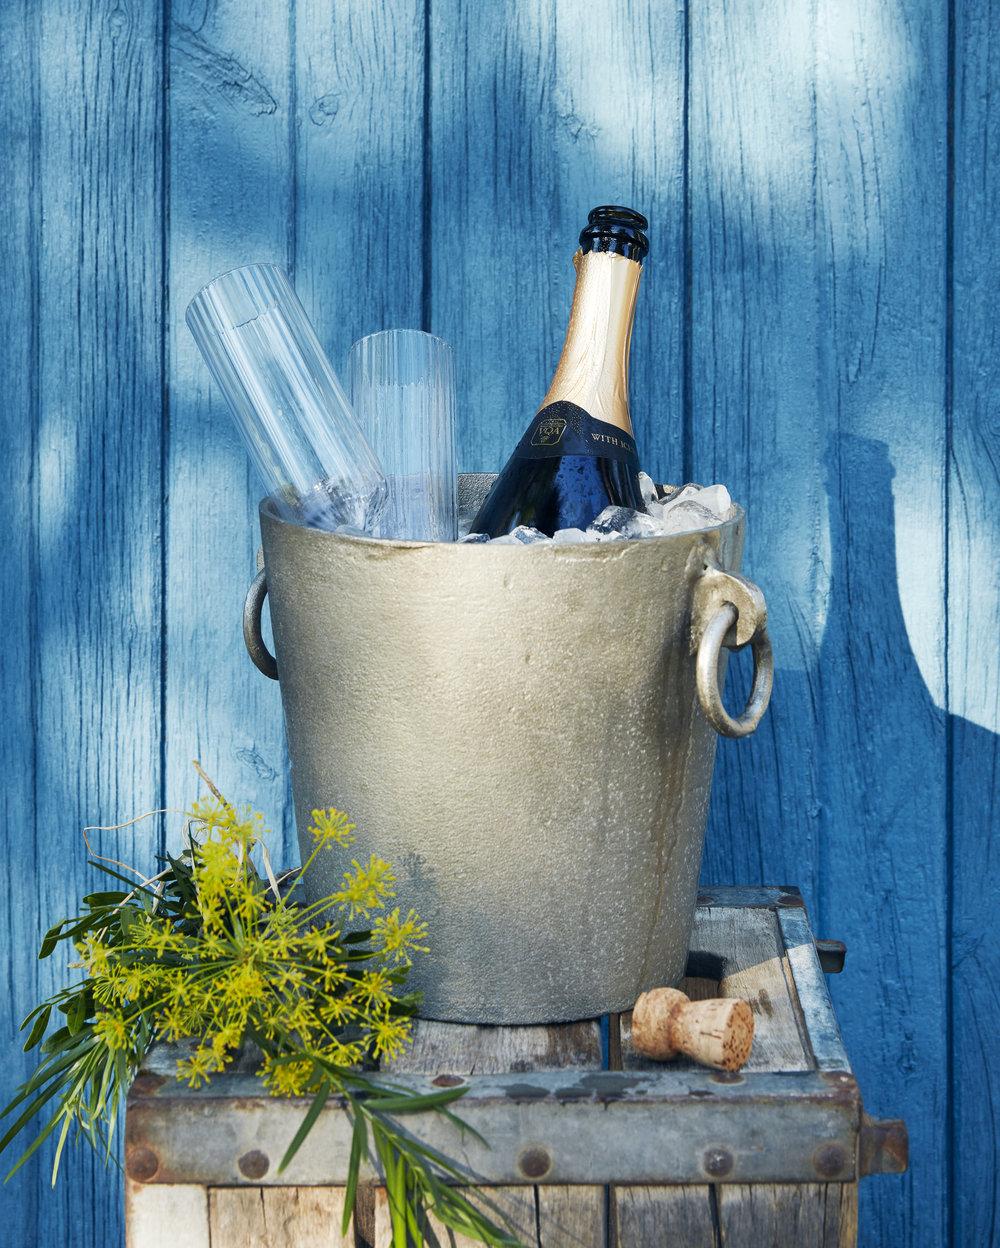 18054KLD-FDM_OntWines_ChampagneCover_V2.jpg